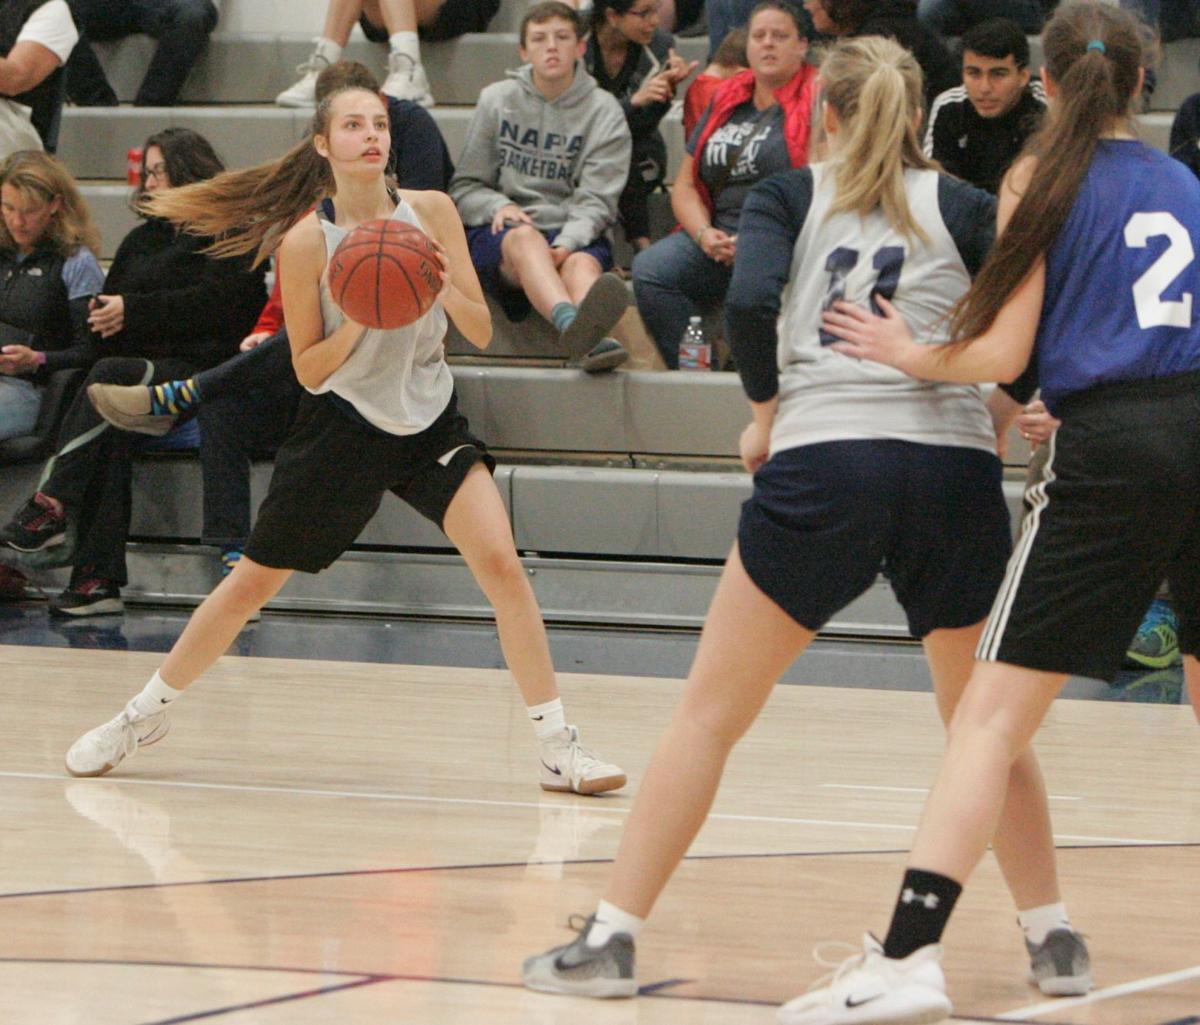 Napa High girls basketball outlook